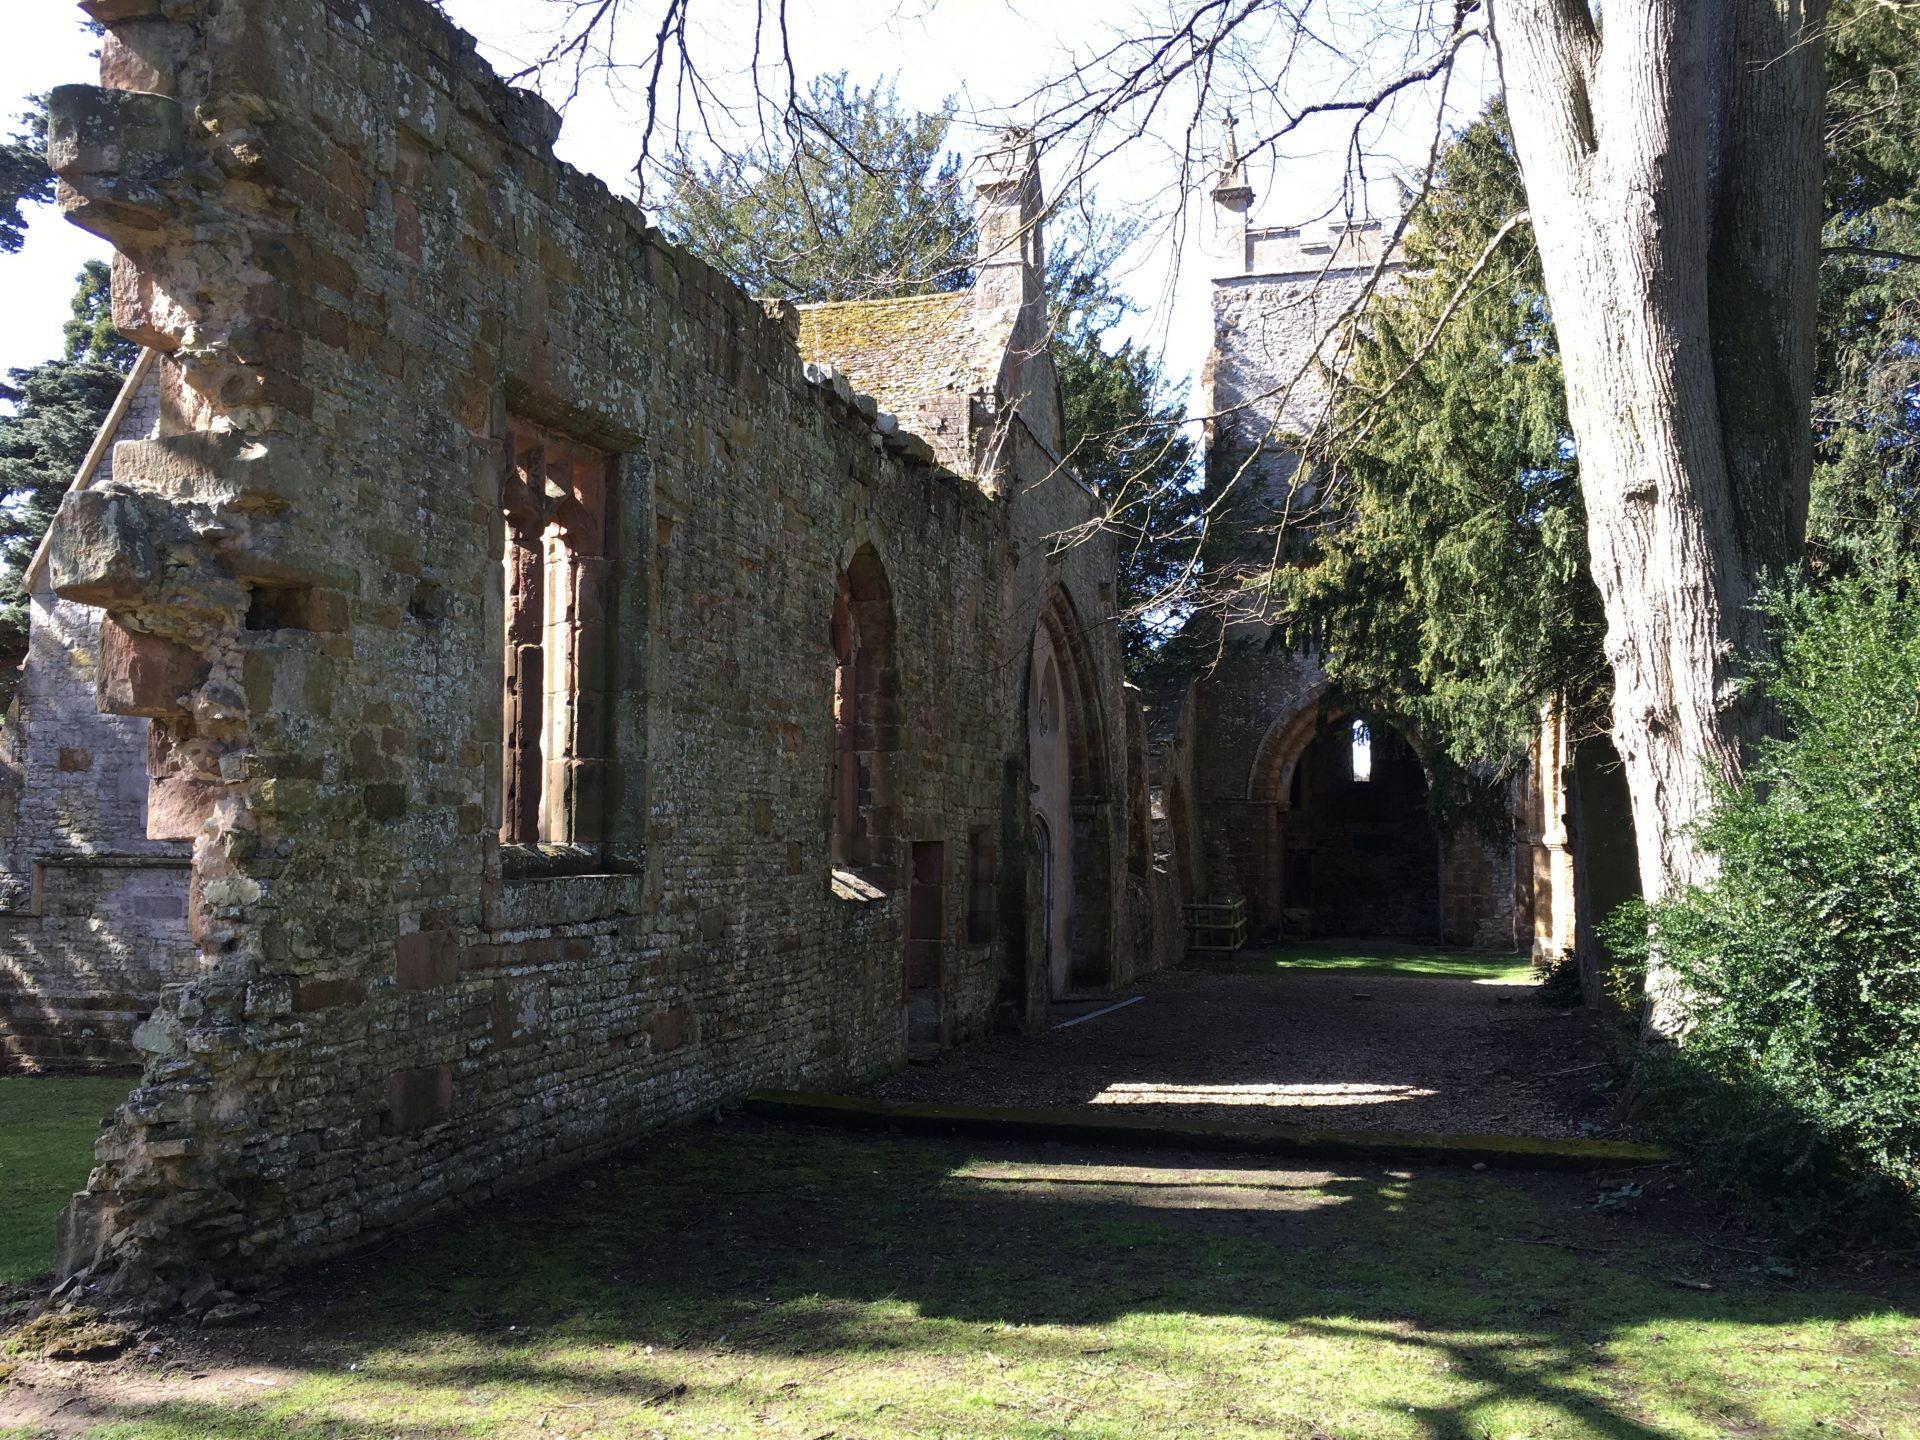 Ettington Park Hotel ruins